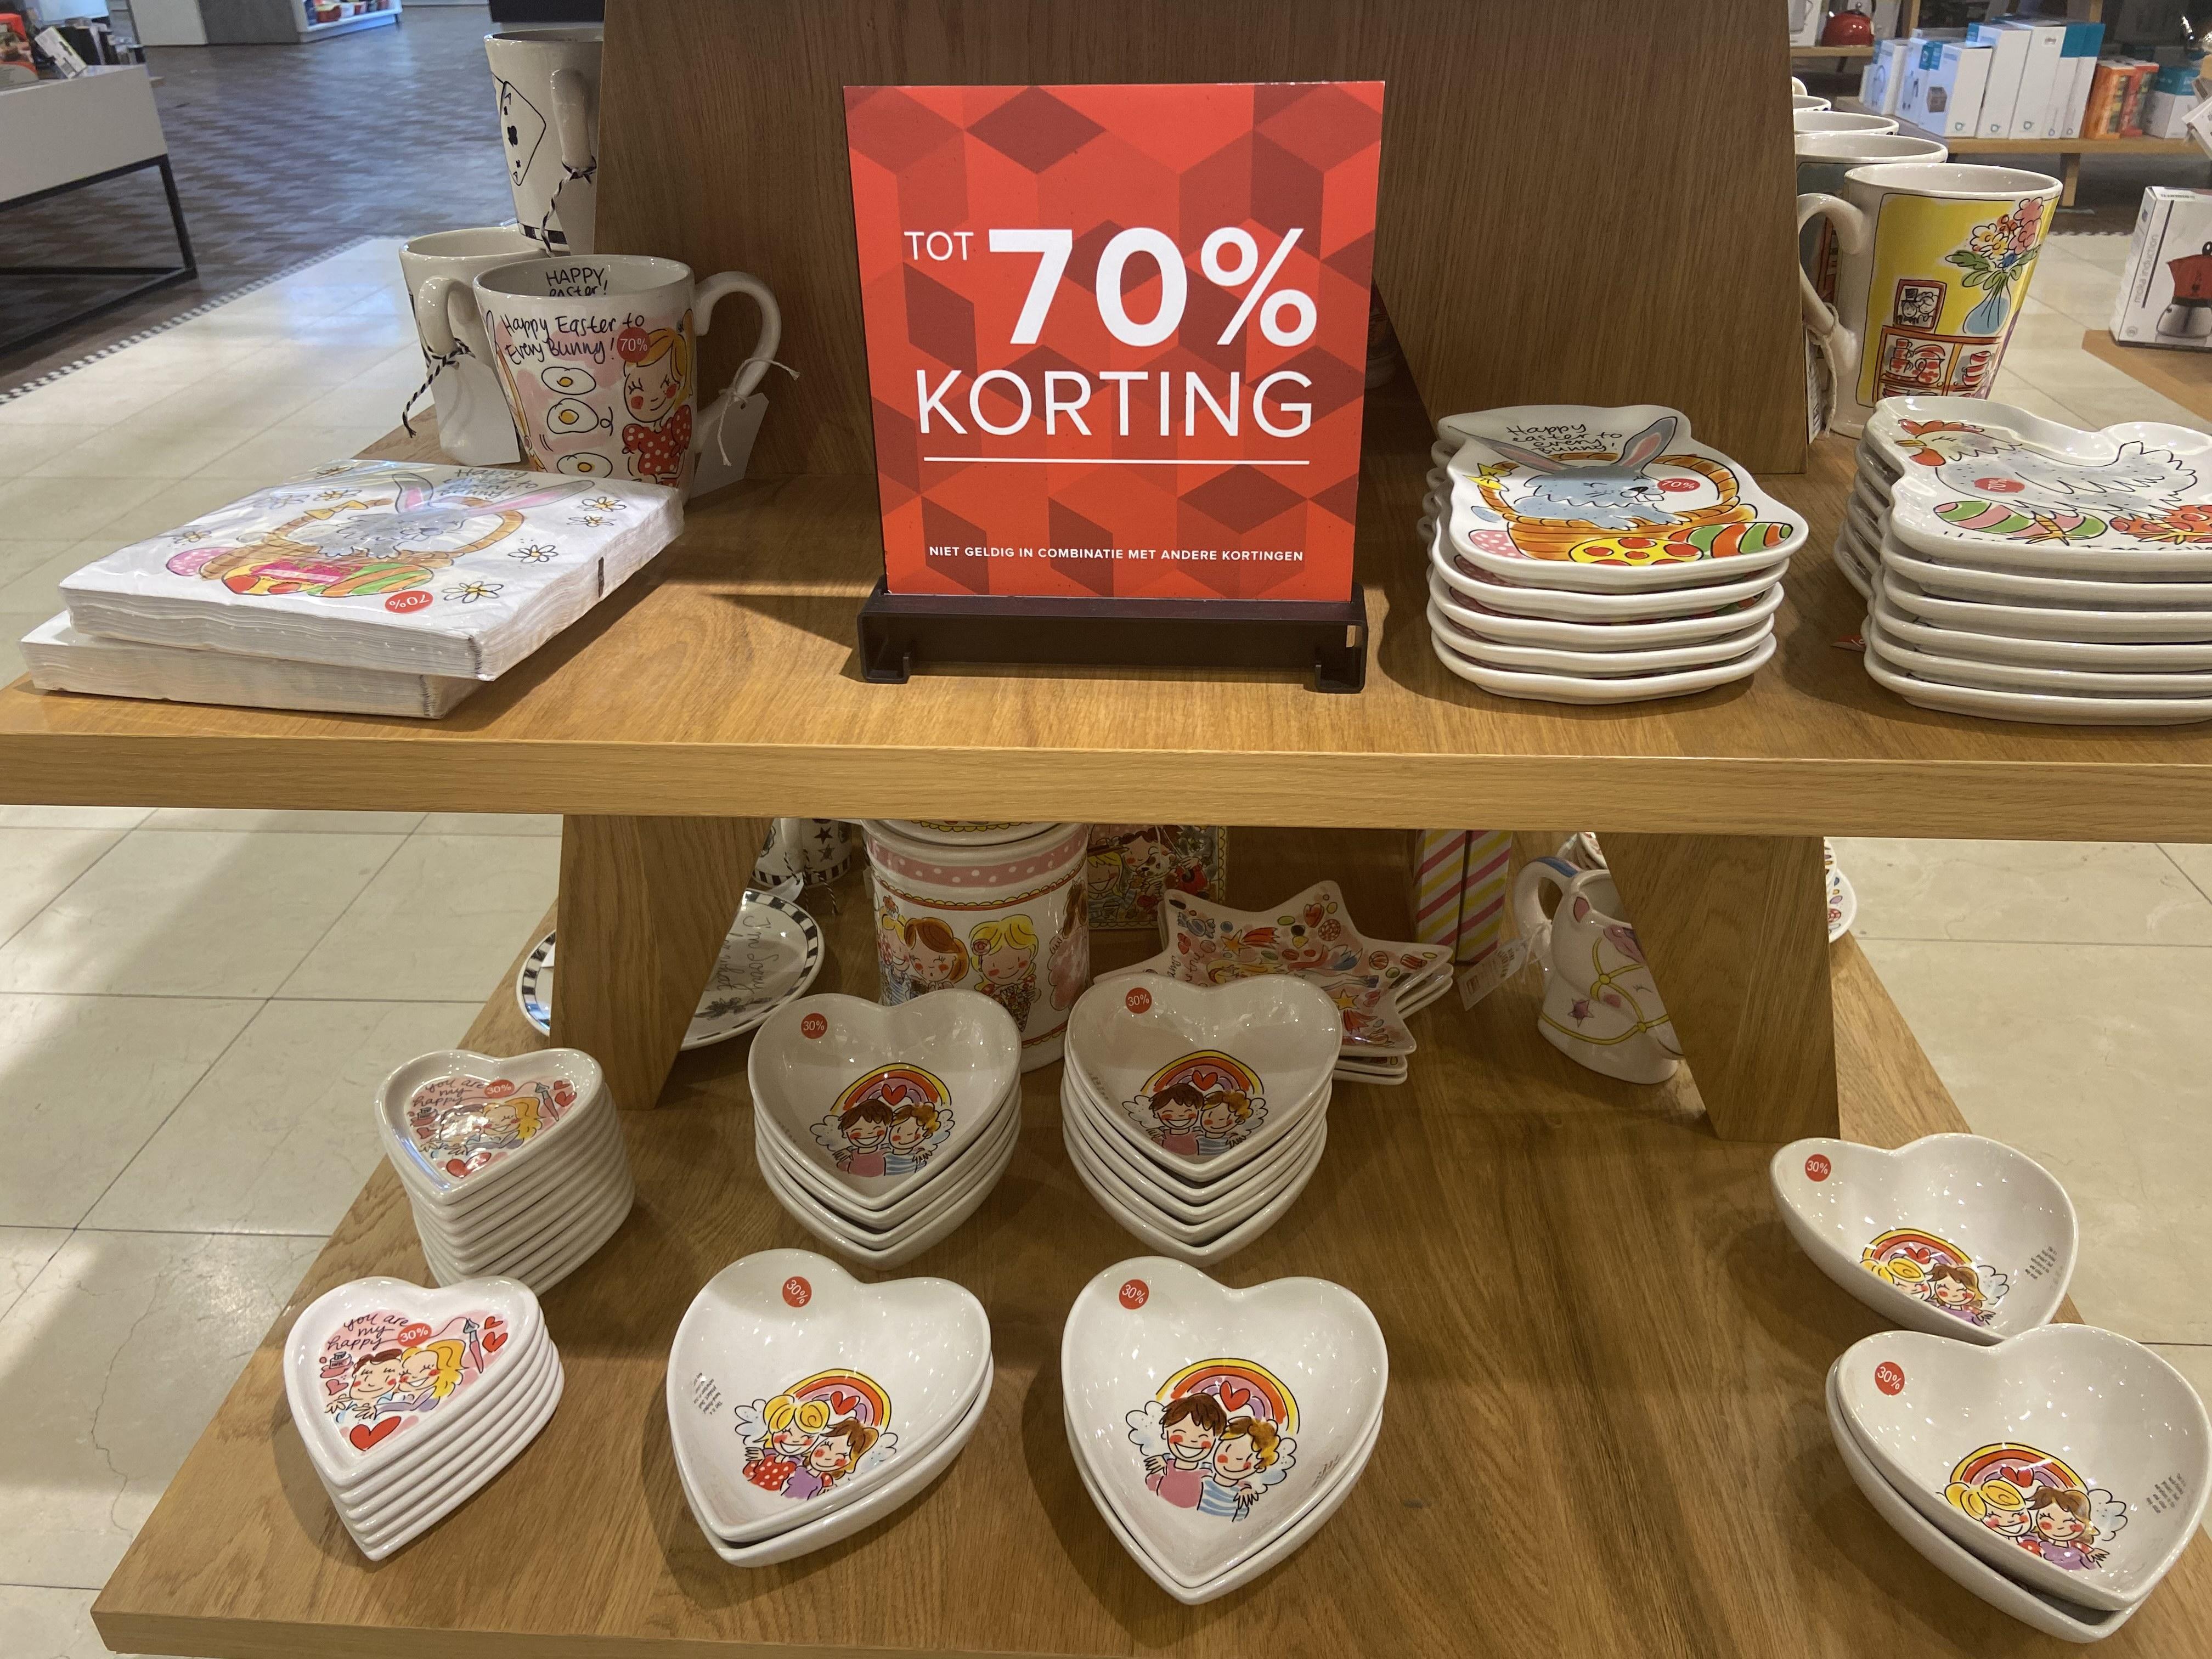 Blond amsterdam tot 70% korting! ( lokaal?) @Bijenkorf Amsterdam